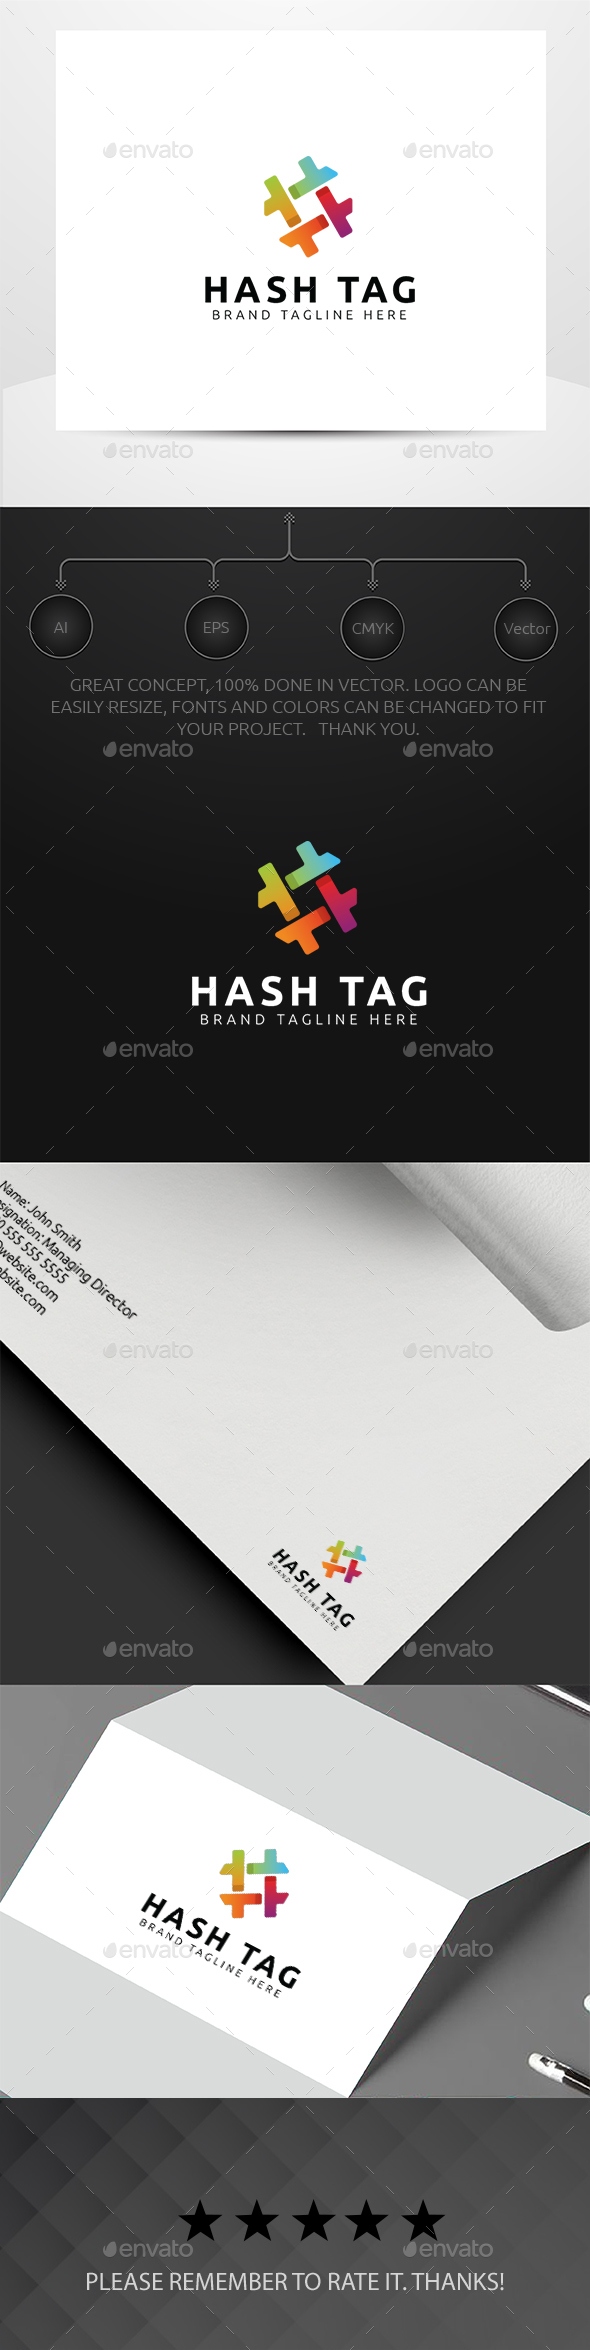 GraphicRiver Hash Tag 20458527